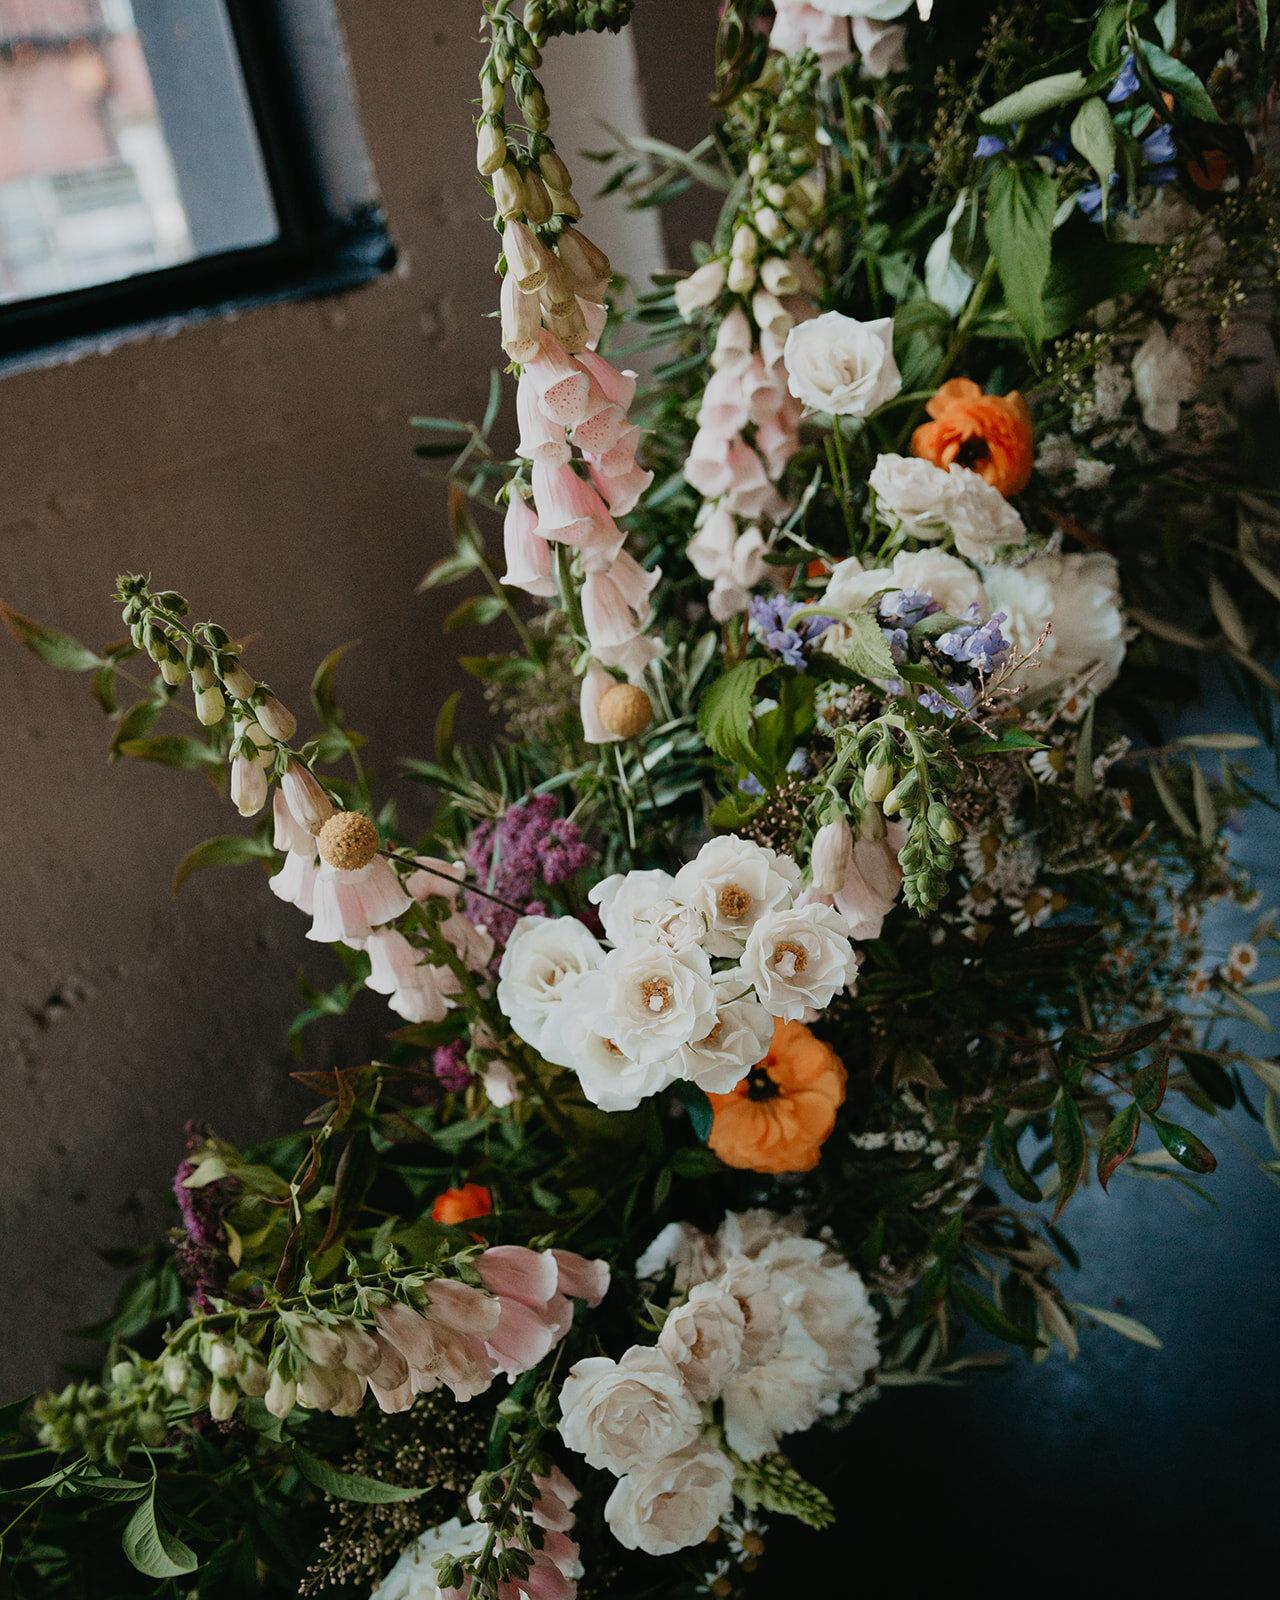 Colorful Downtown Portland Castaway Wedding - Venue Details (17 of 61)_websize.jpg